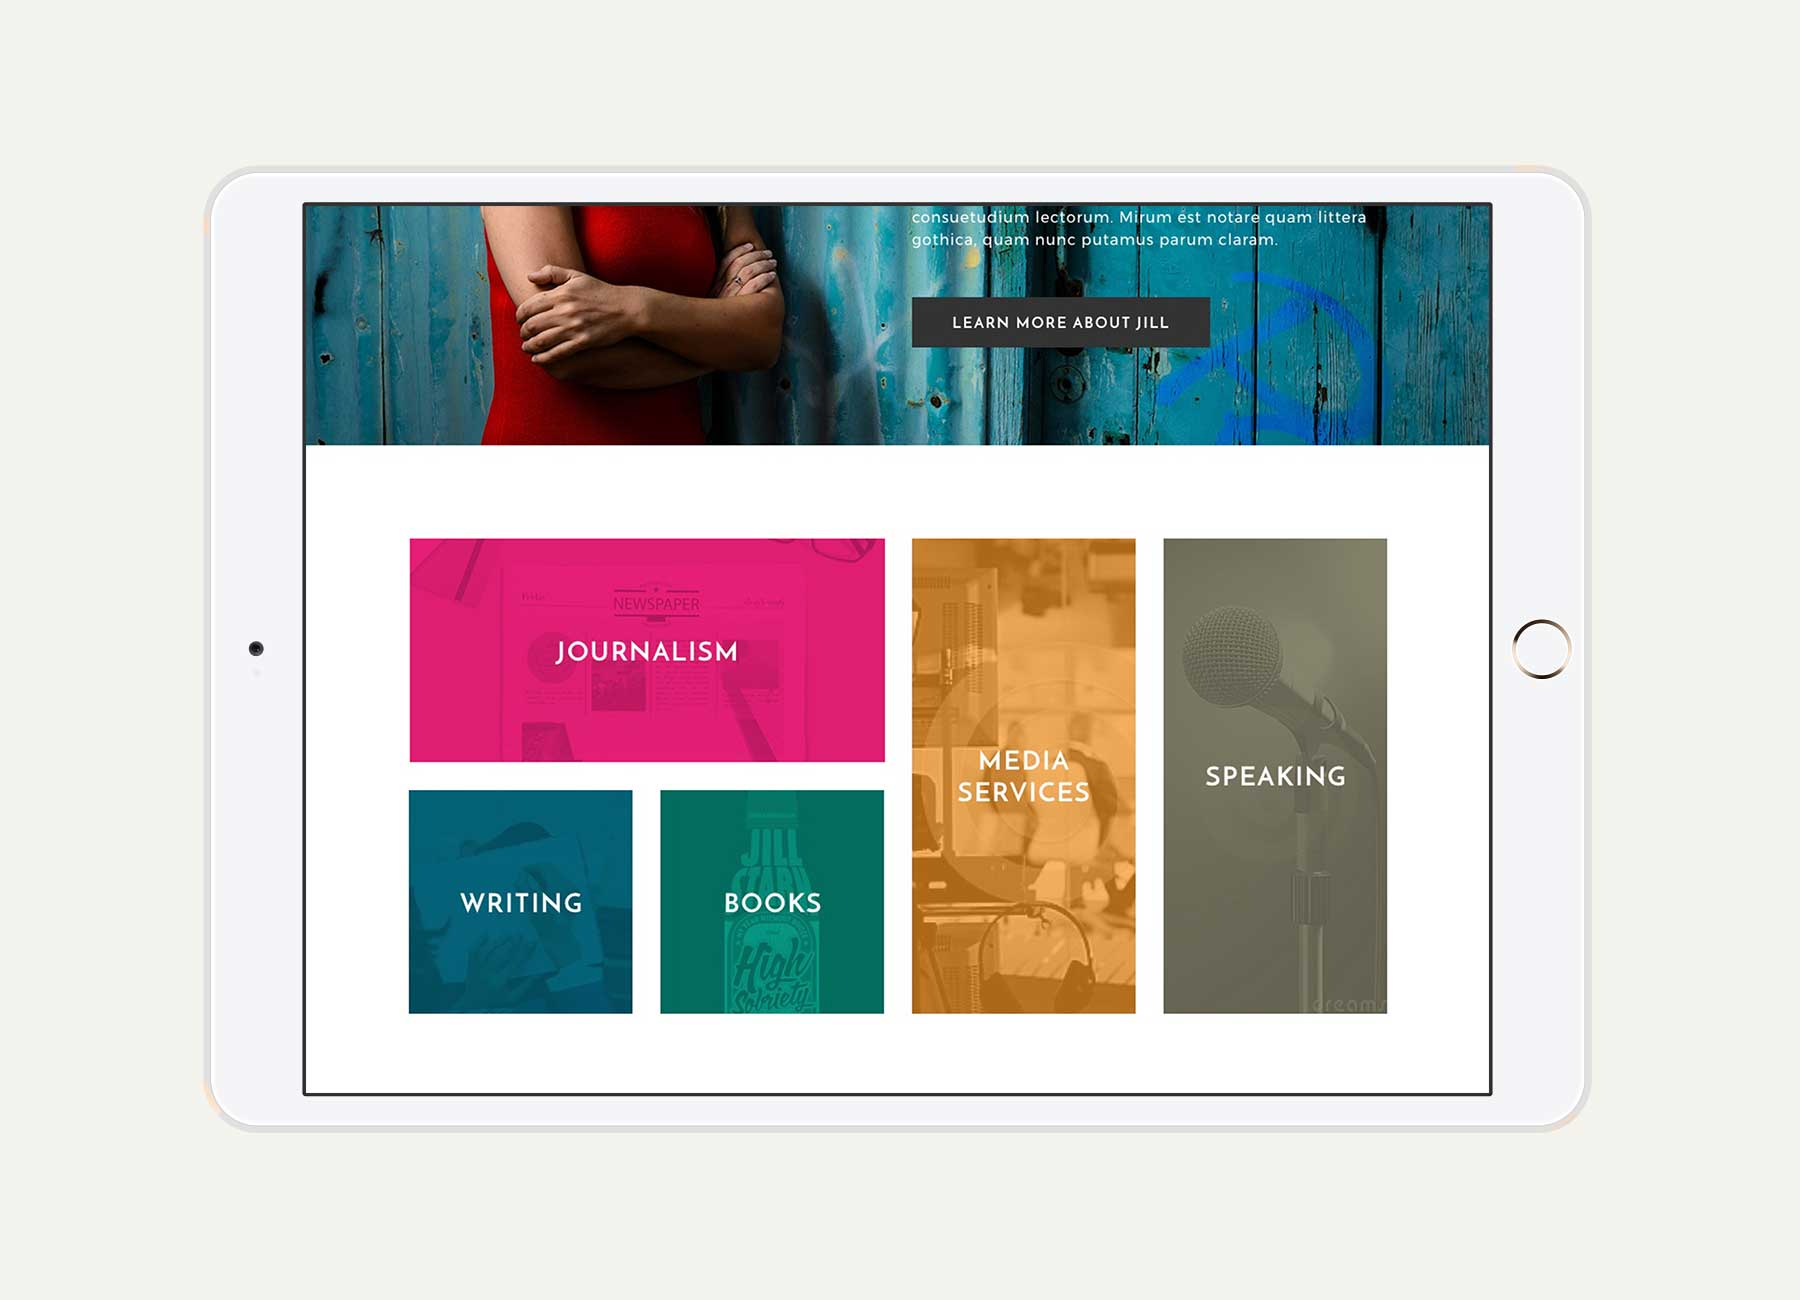 Jill Stark responsive website for navigation menu on iPad in landscape view